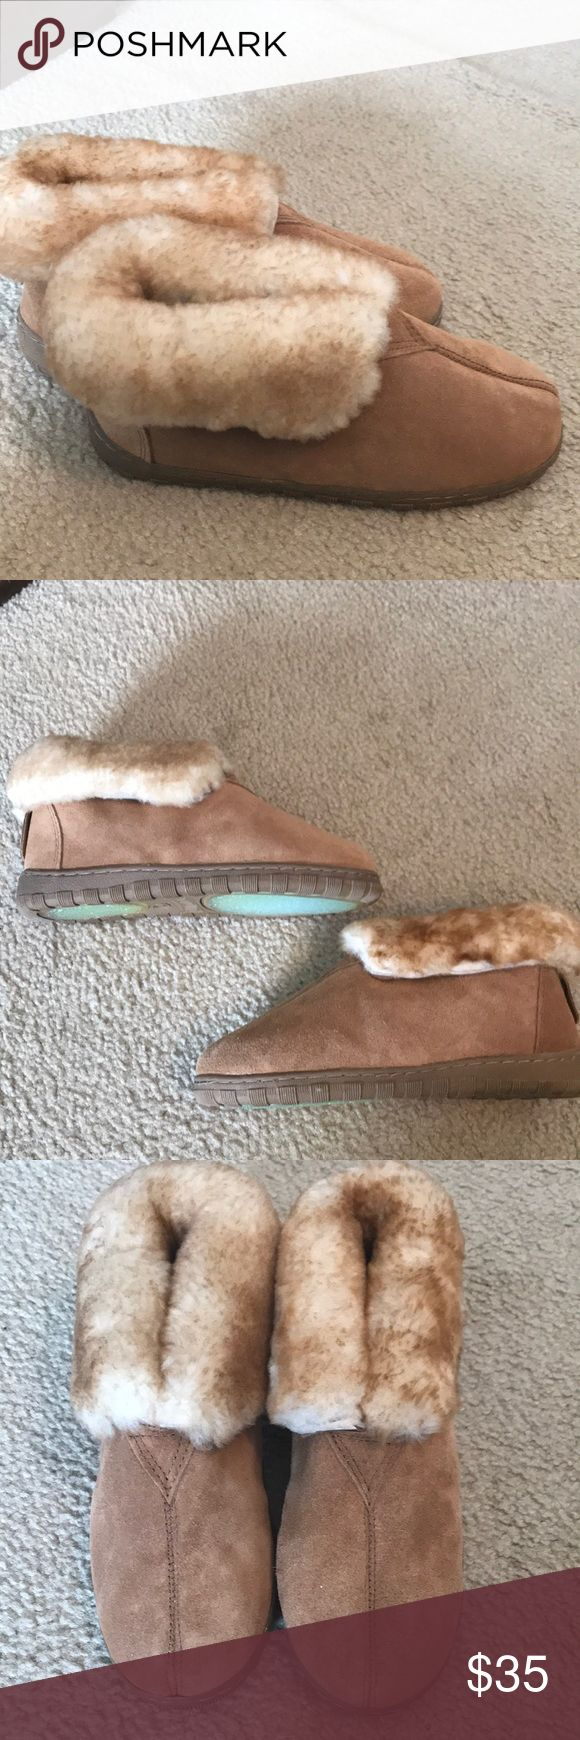 Cloud Nine Sheepskin slippers Brand new.  Real sheepskin.  Soft and comfy. Cloud 9 Shoes Slippers